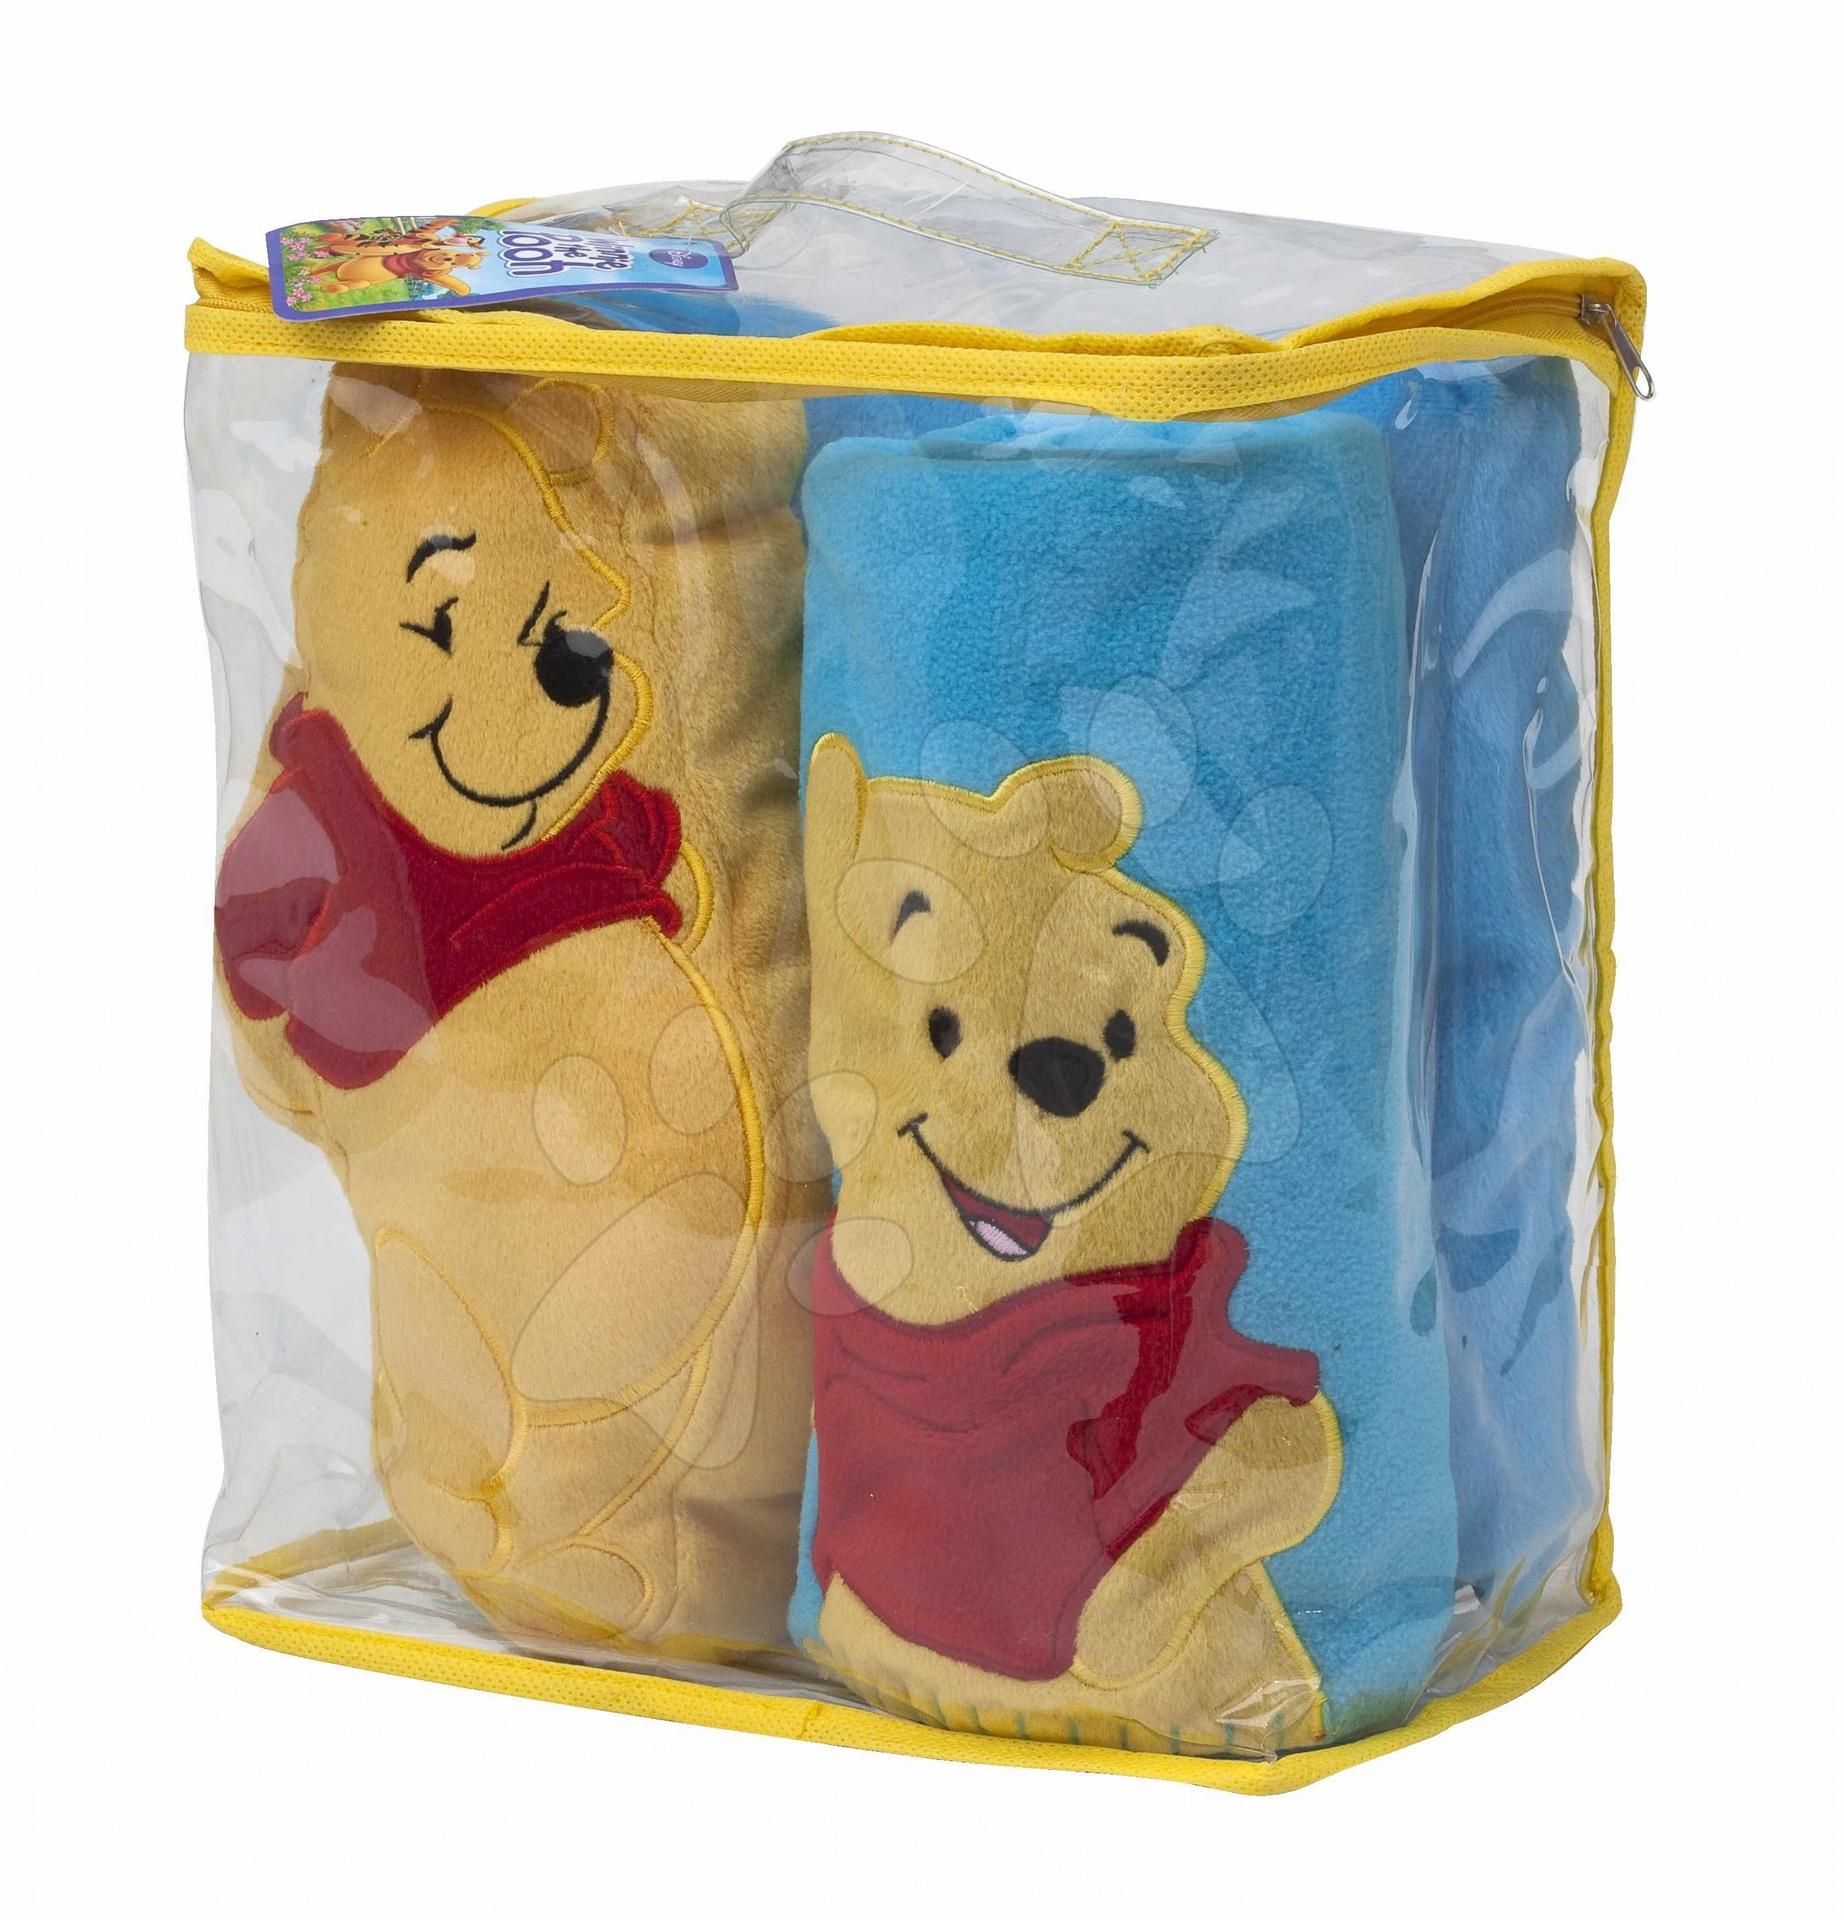 Staré položky - Plyšový set Macko Pooh and Blanket Ilanit 100*70 cm